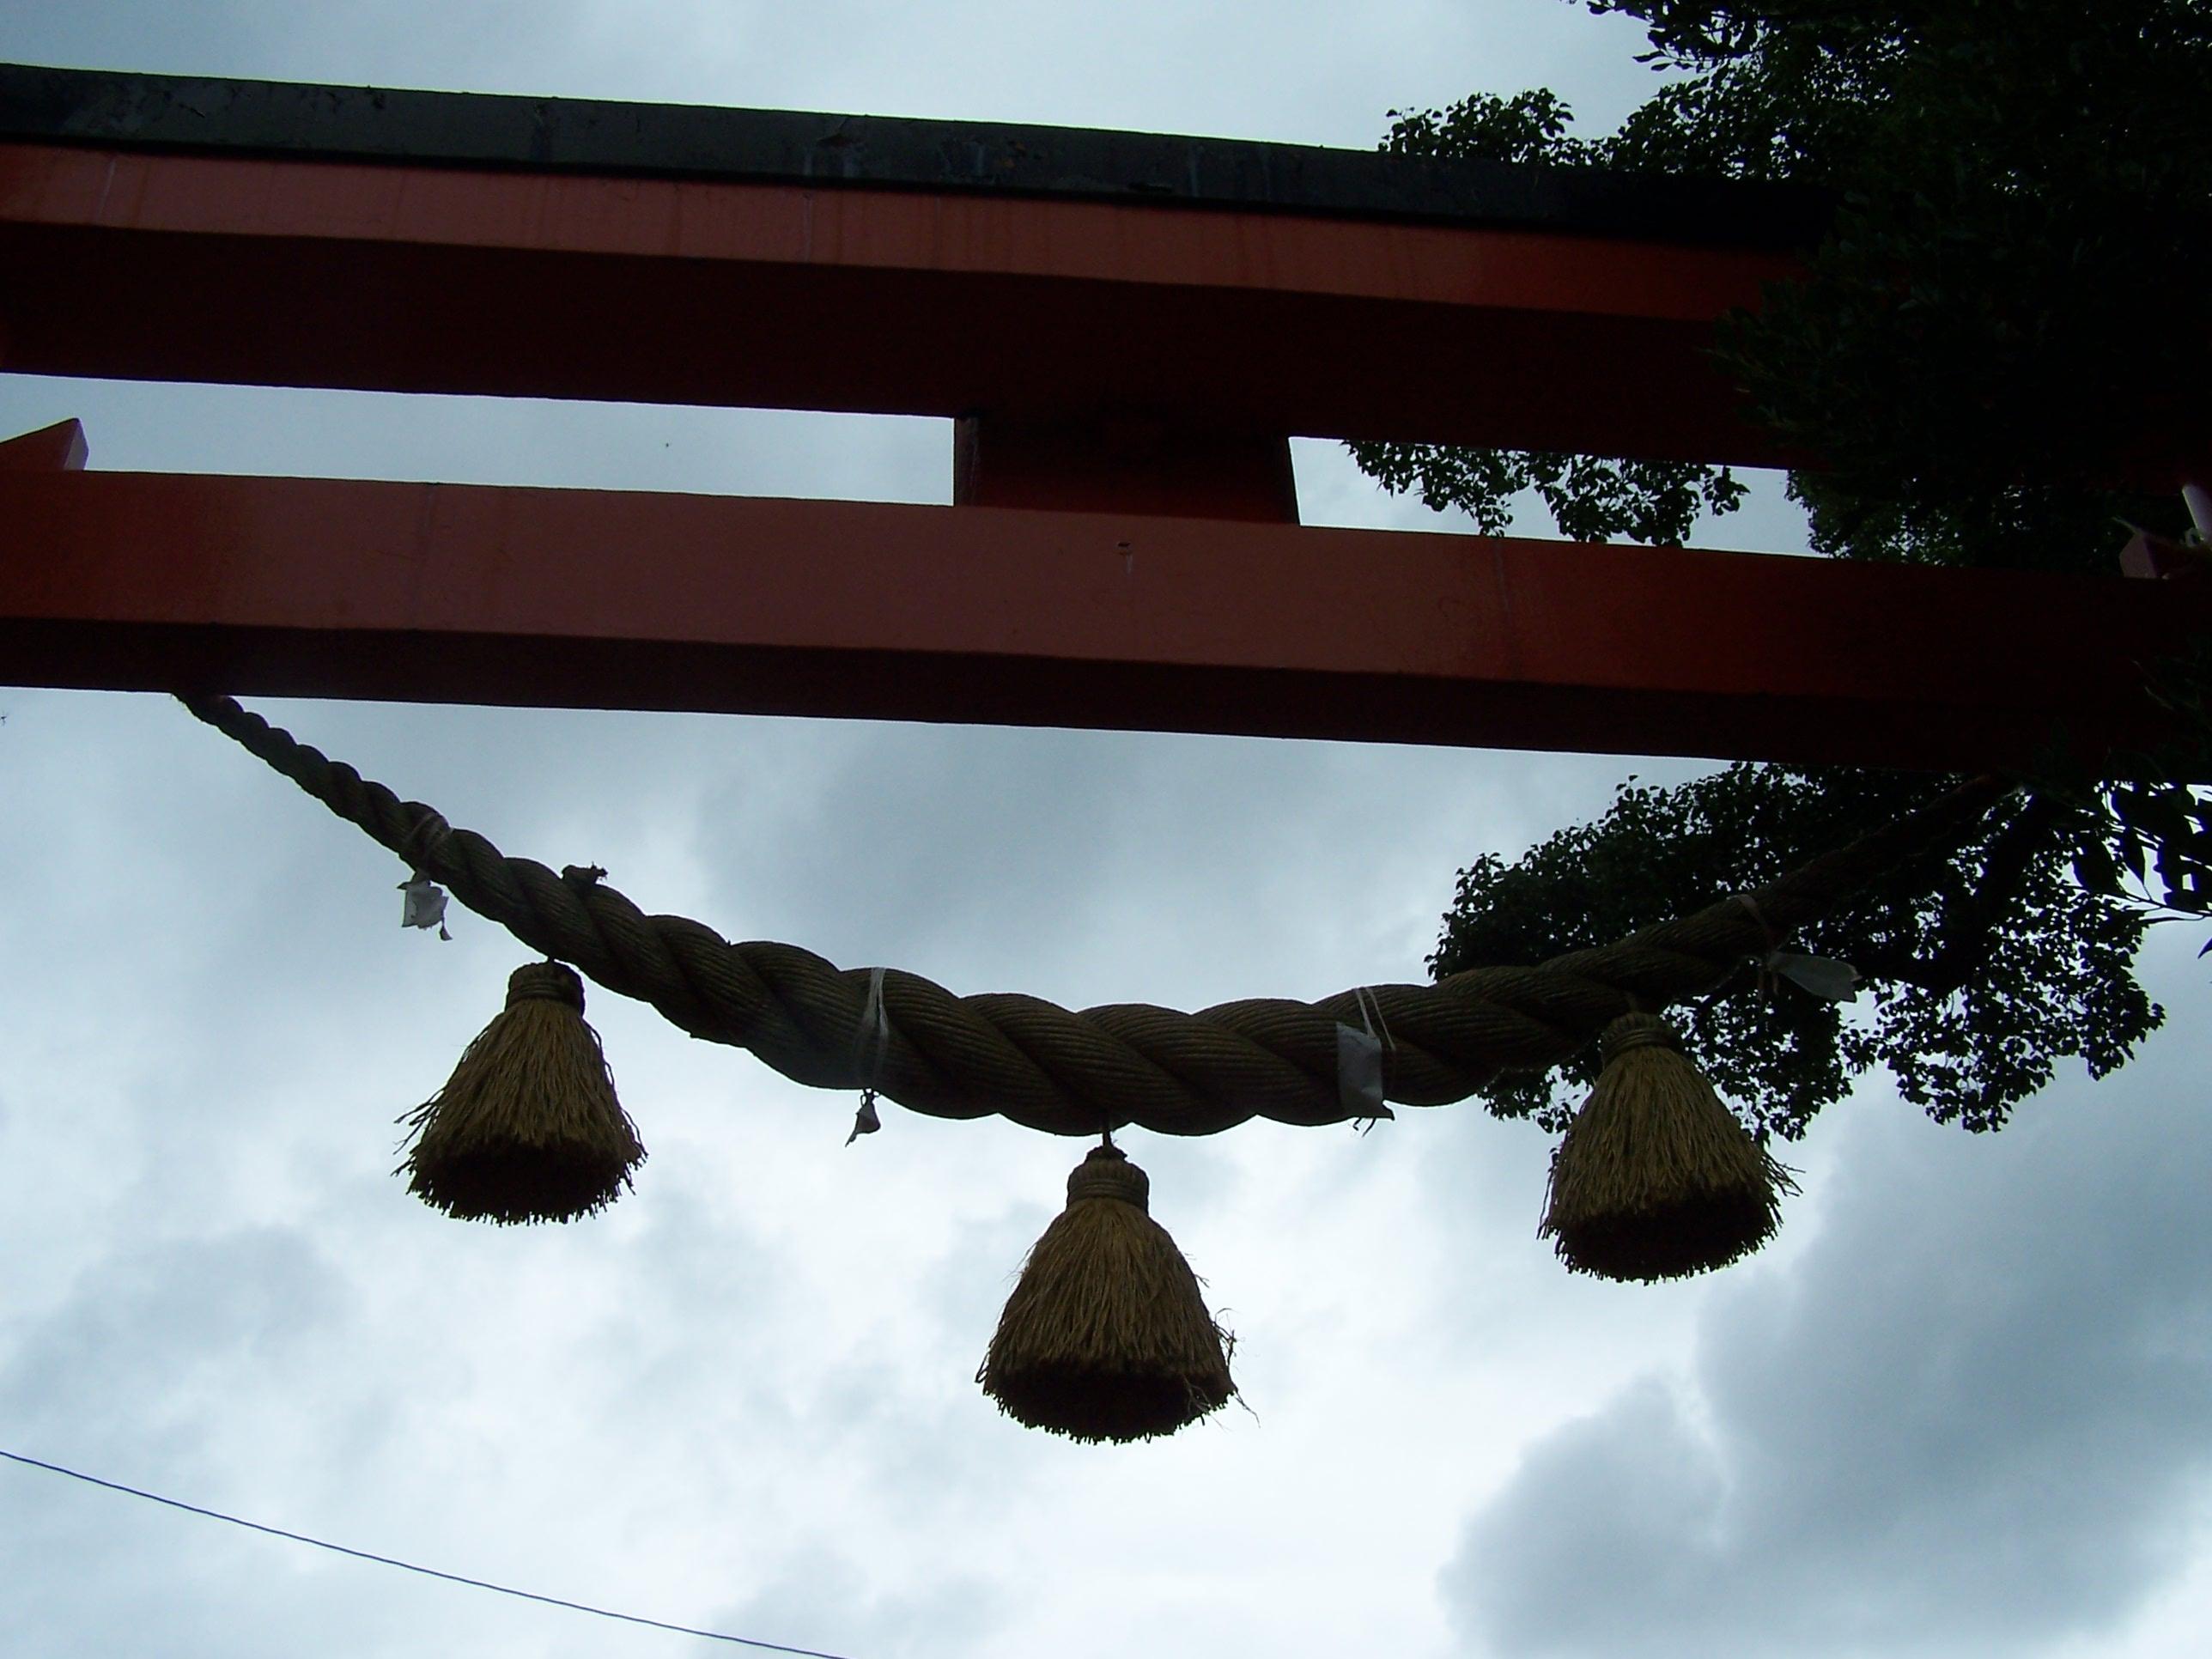 shimenawa-nagasaki